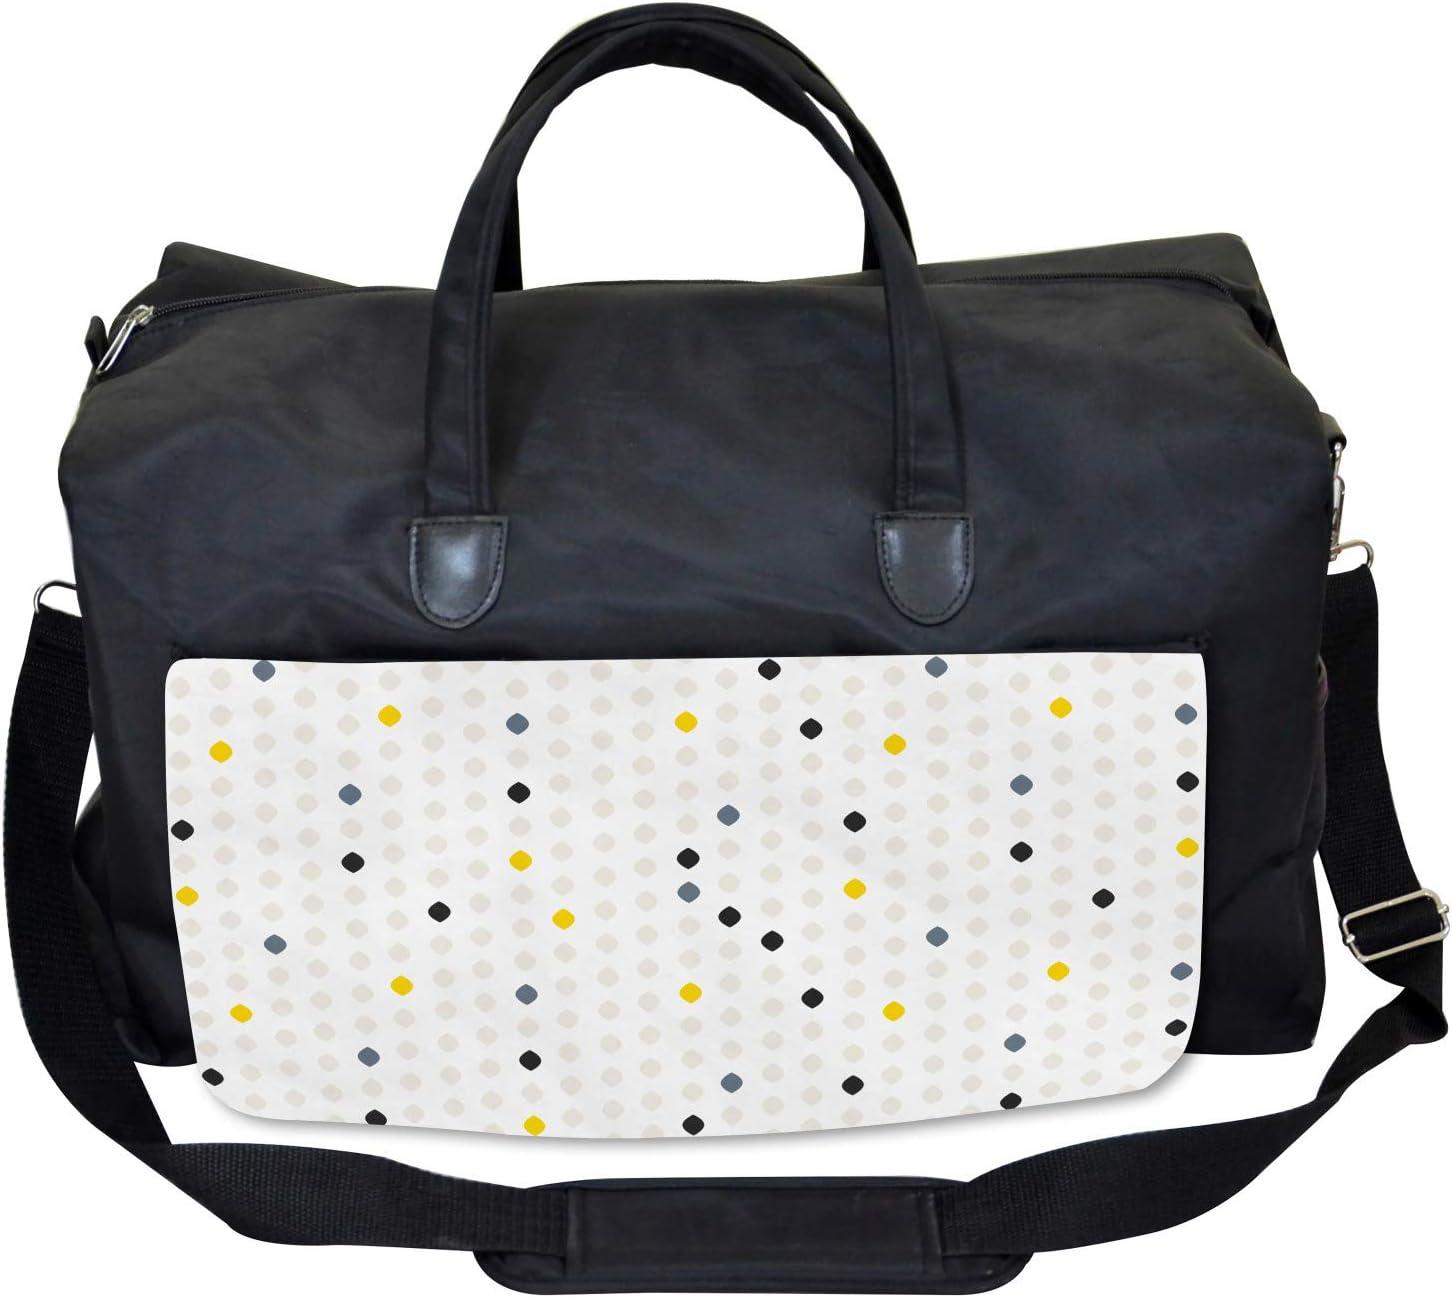 Large Weekender Carry-on Ambesonne Modern Gym Bag Polka Dots Geometric